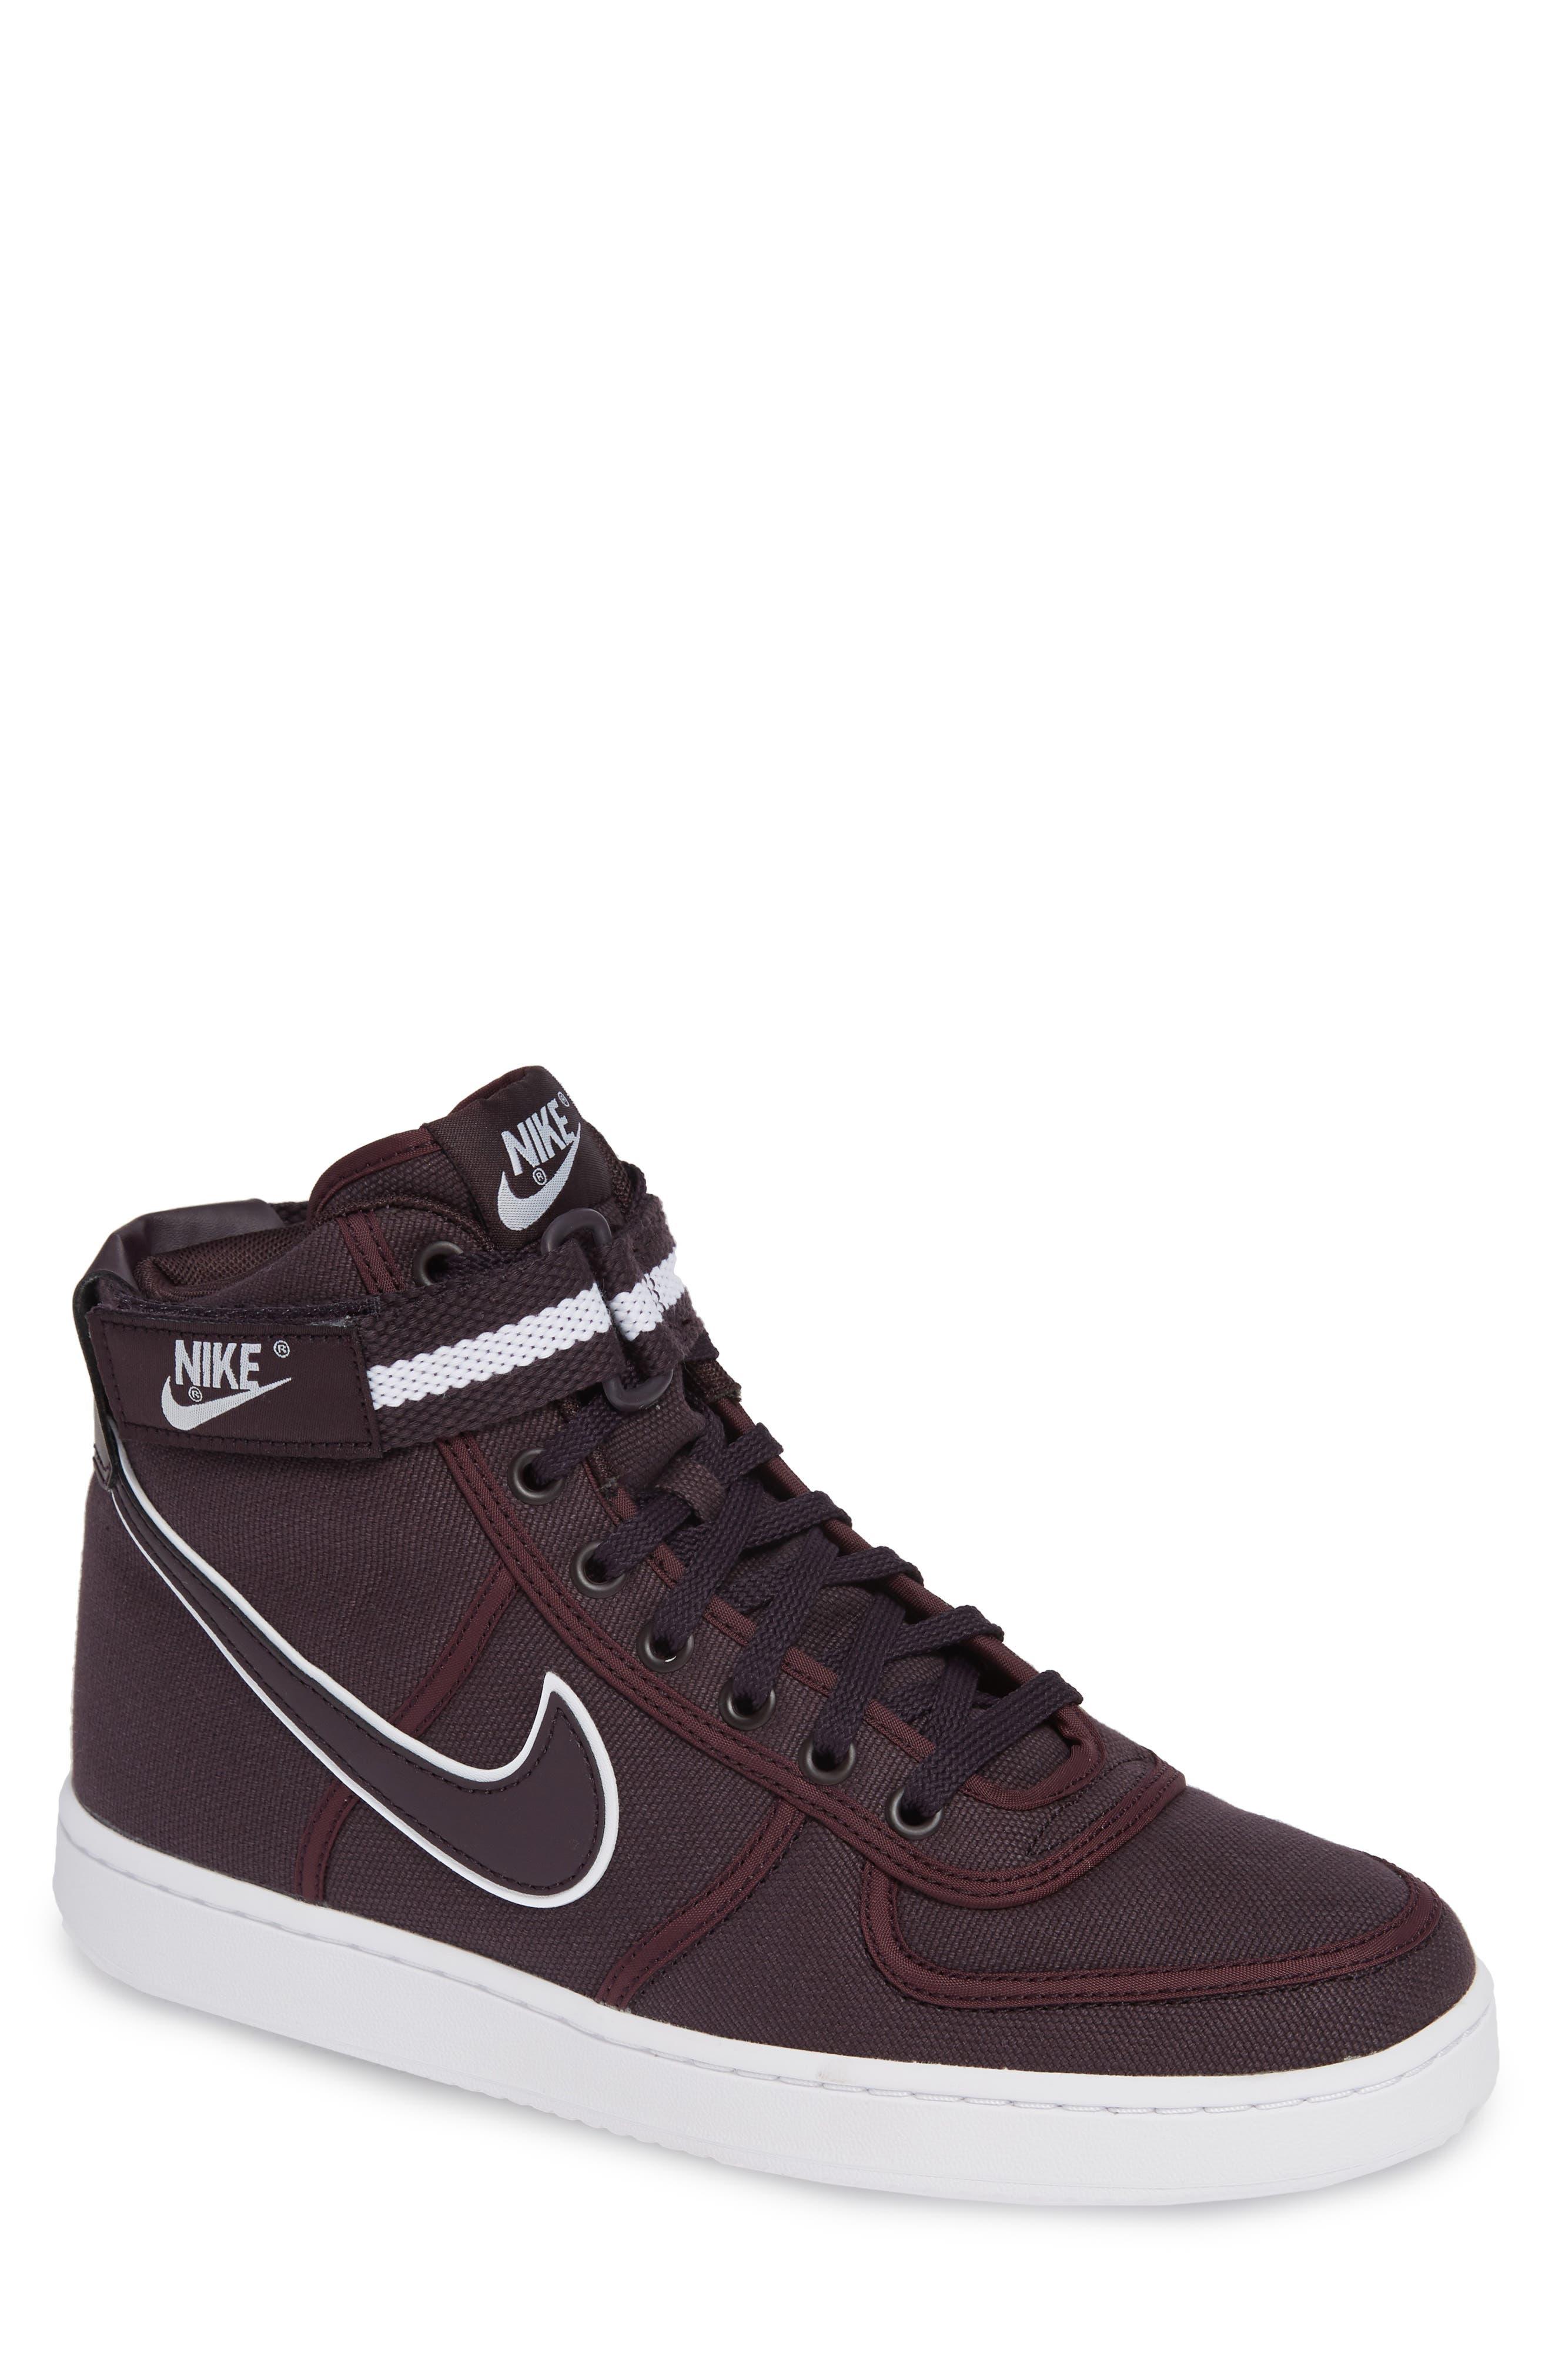 Vandal High Supreme High Top Sneaker,                             Main thumbnail 1, color,                             Burgundy Ash/ White